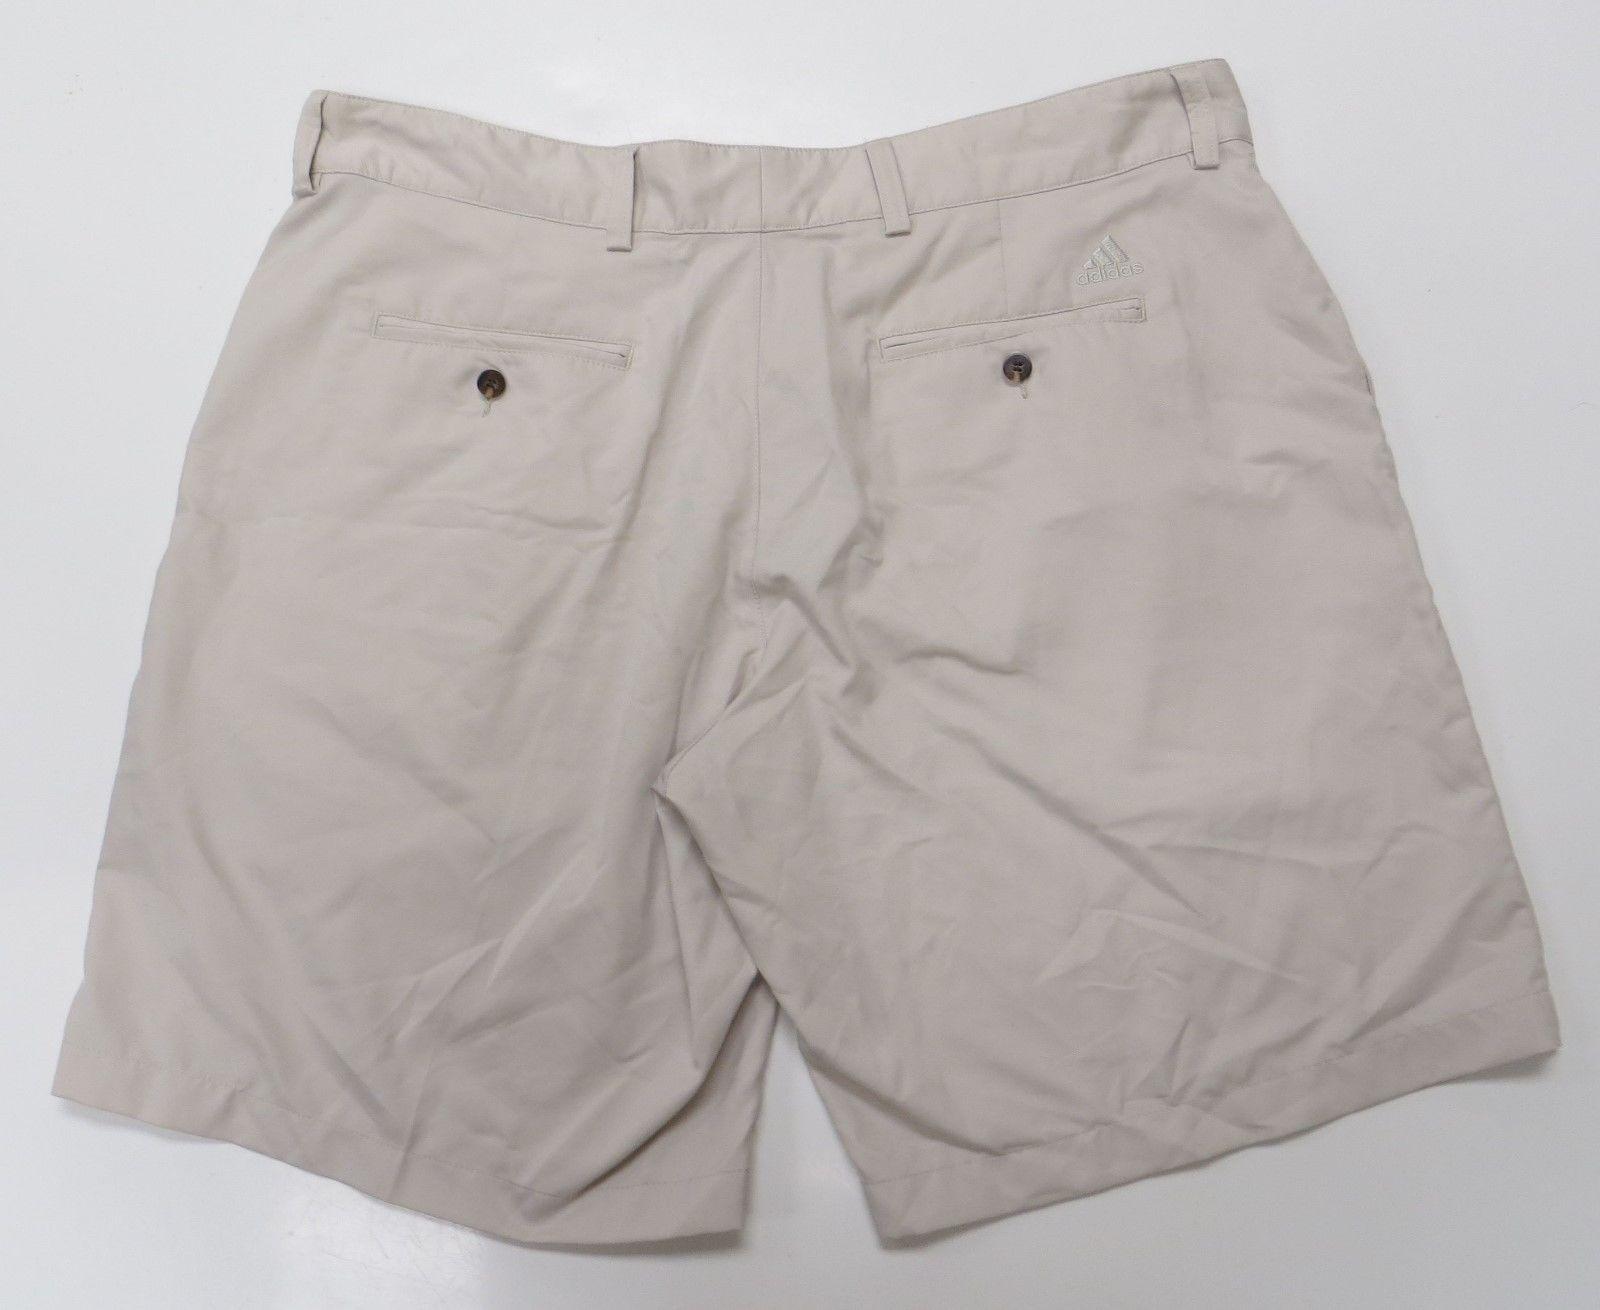 8e716c6a7 Adidas Climalite Pleated Golf Shorts